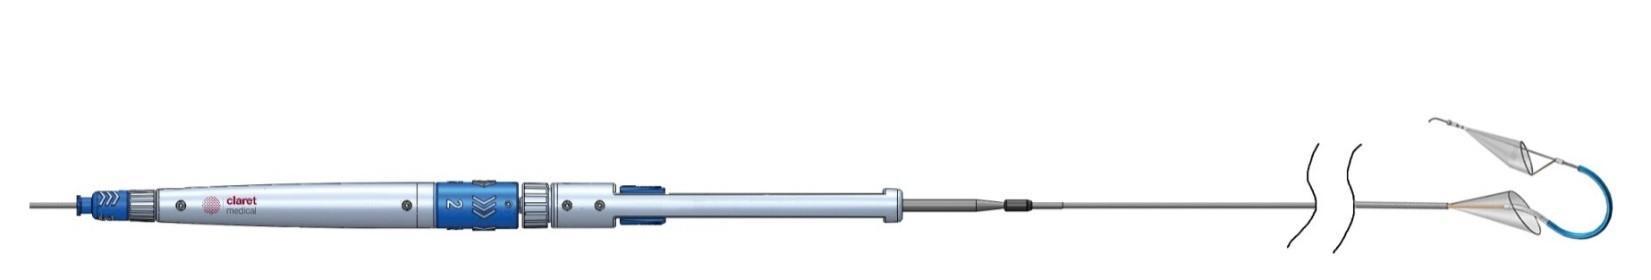 Claret Medical Sentinel Cerebral Protection System CPS TAVR Embolic Protection